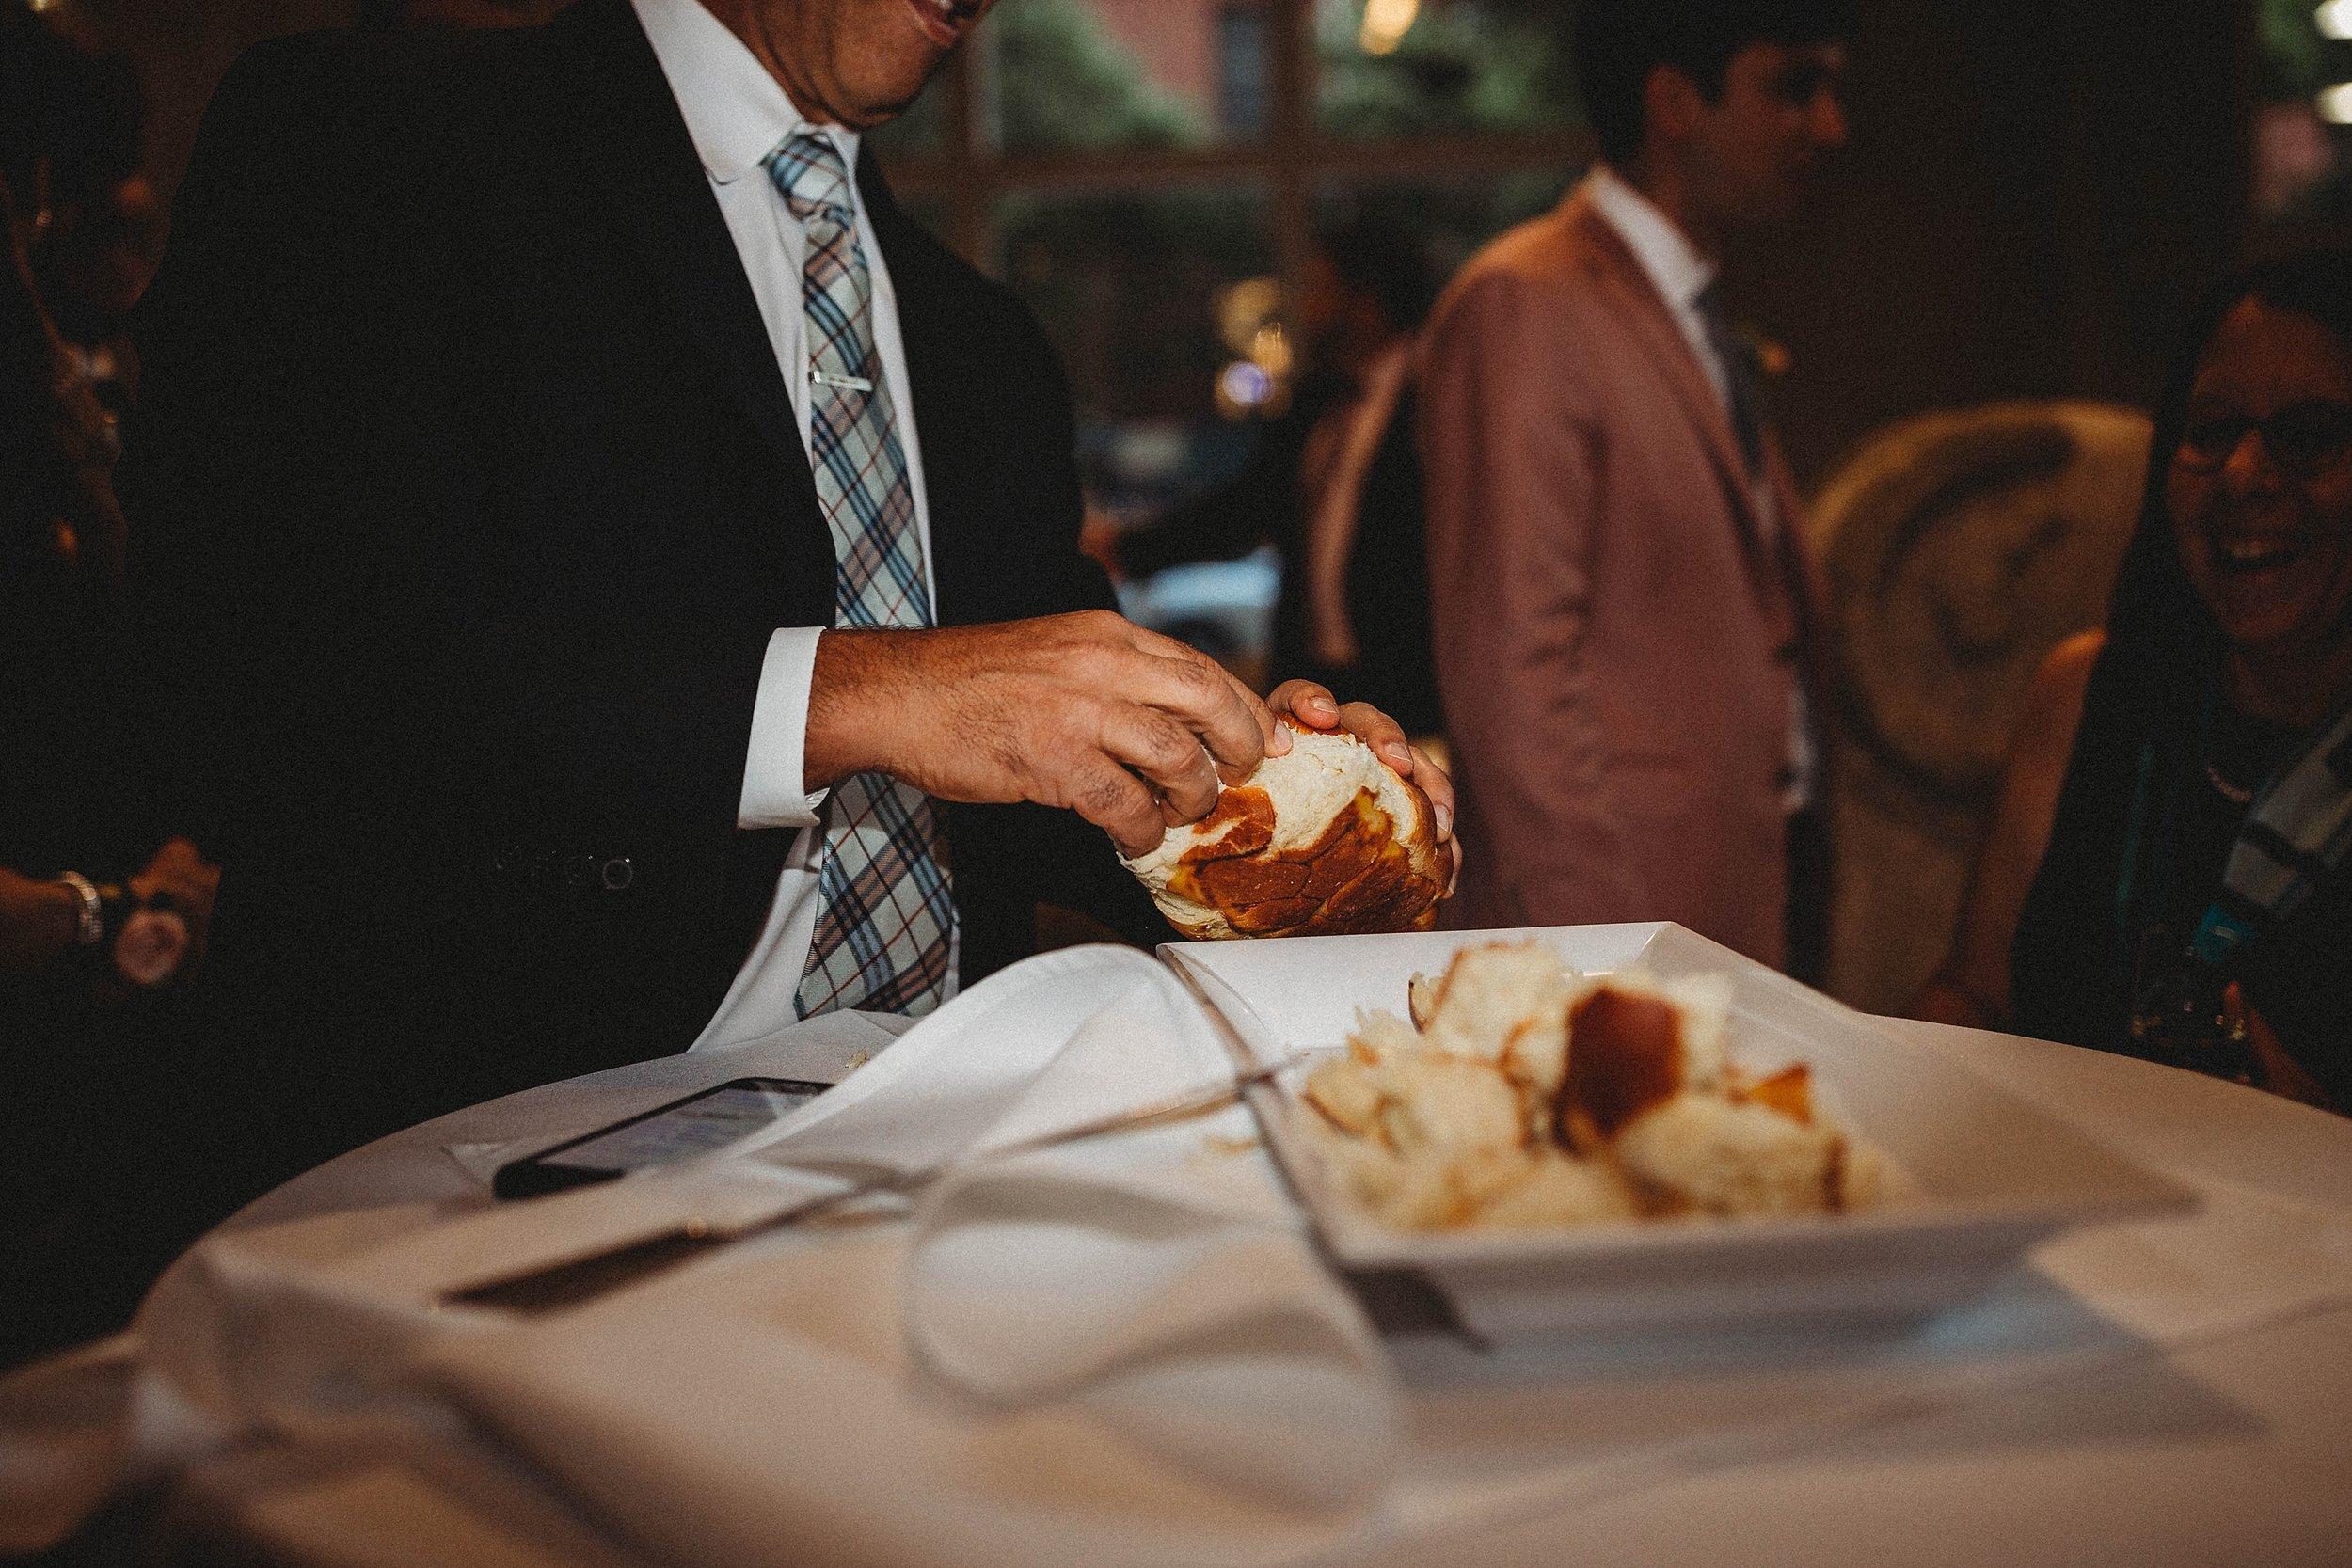 yinshi david - seattle wedding photographer - SAM wedding volunteer park reception -32.jpg